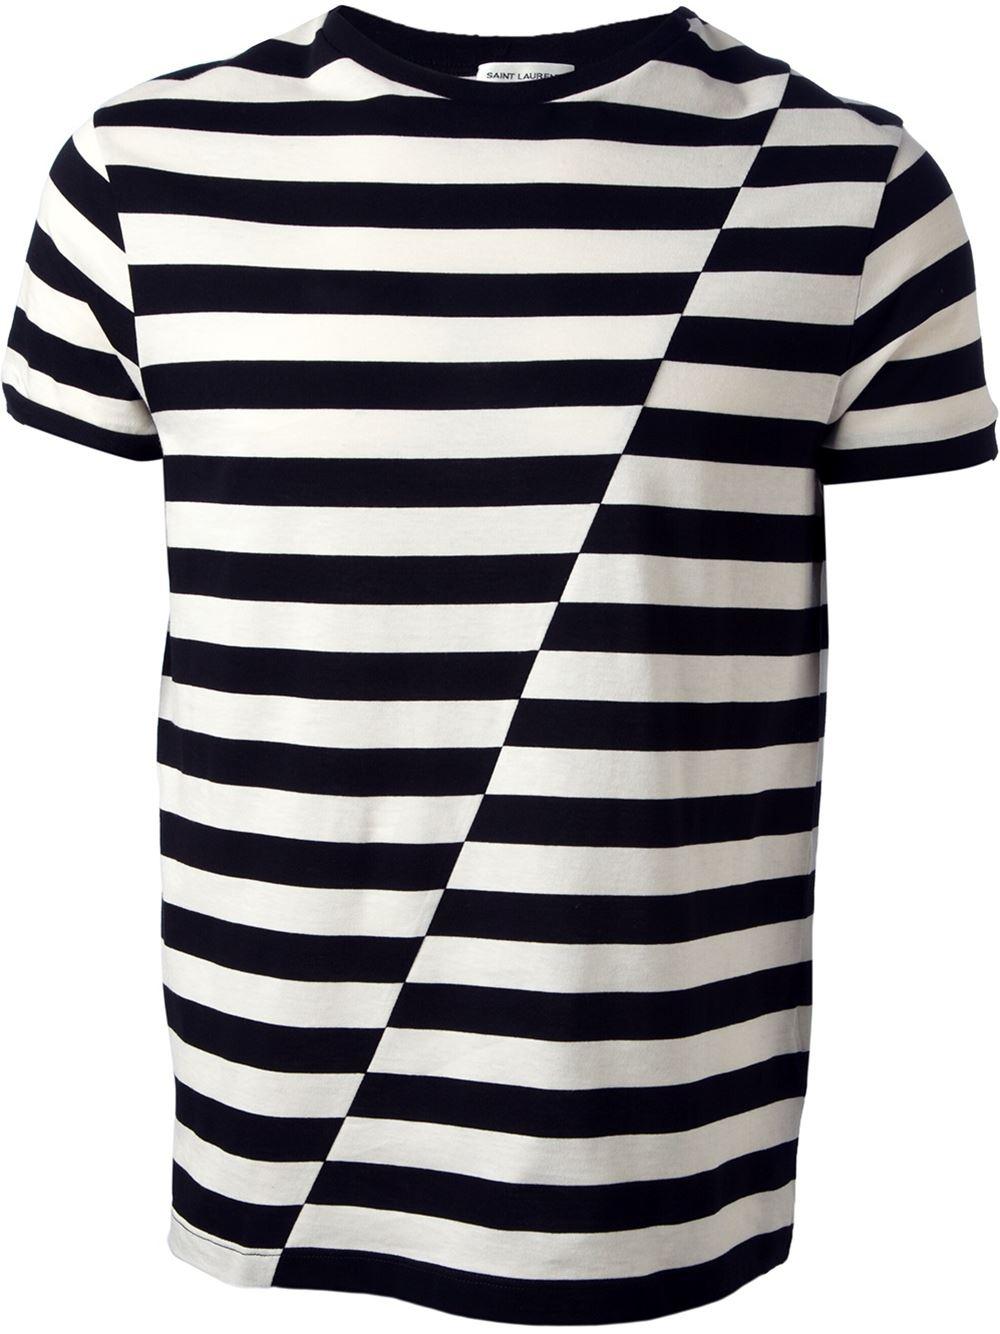 Cheap Striped T Shirts